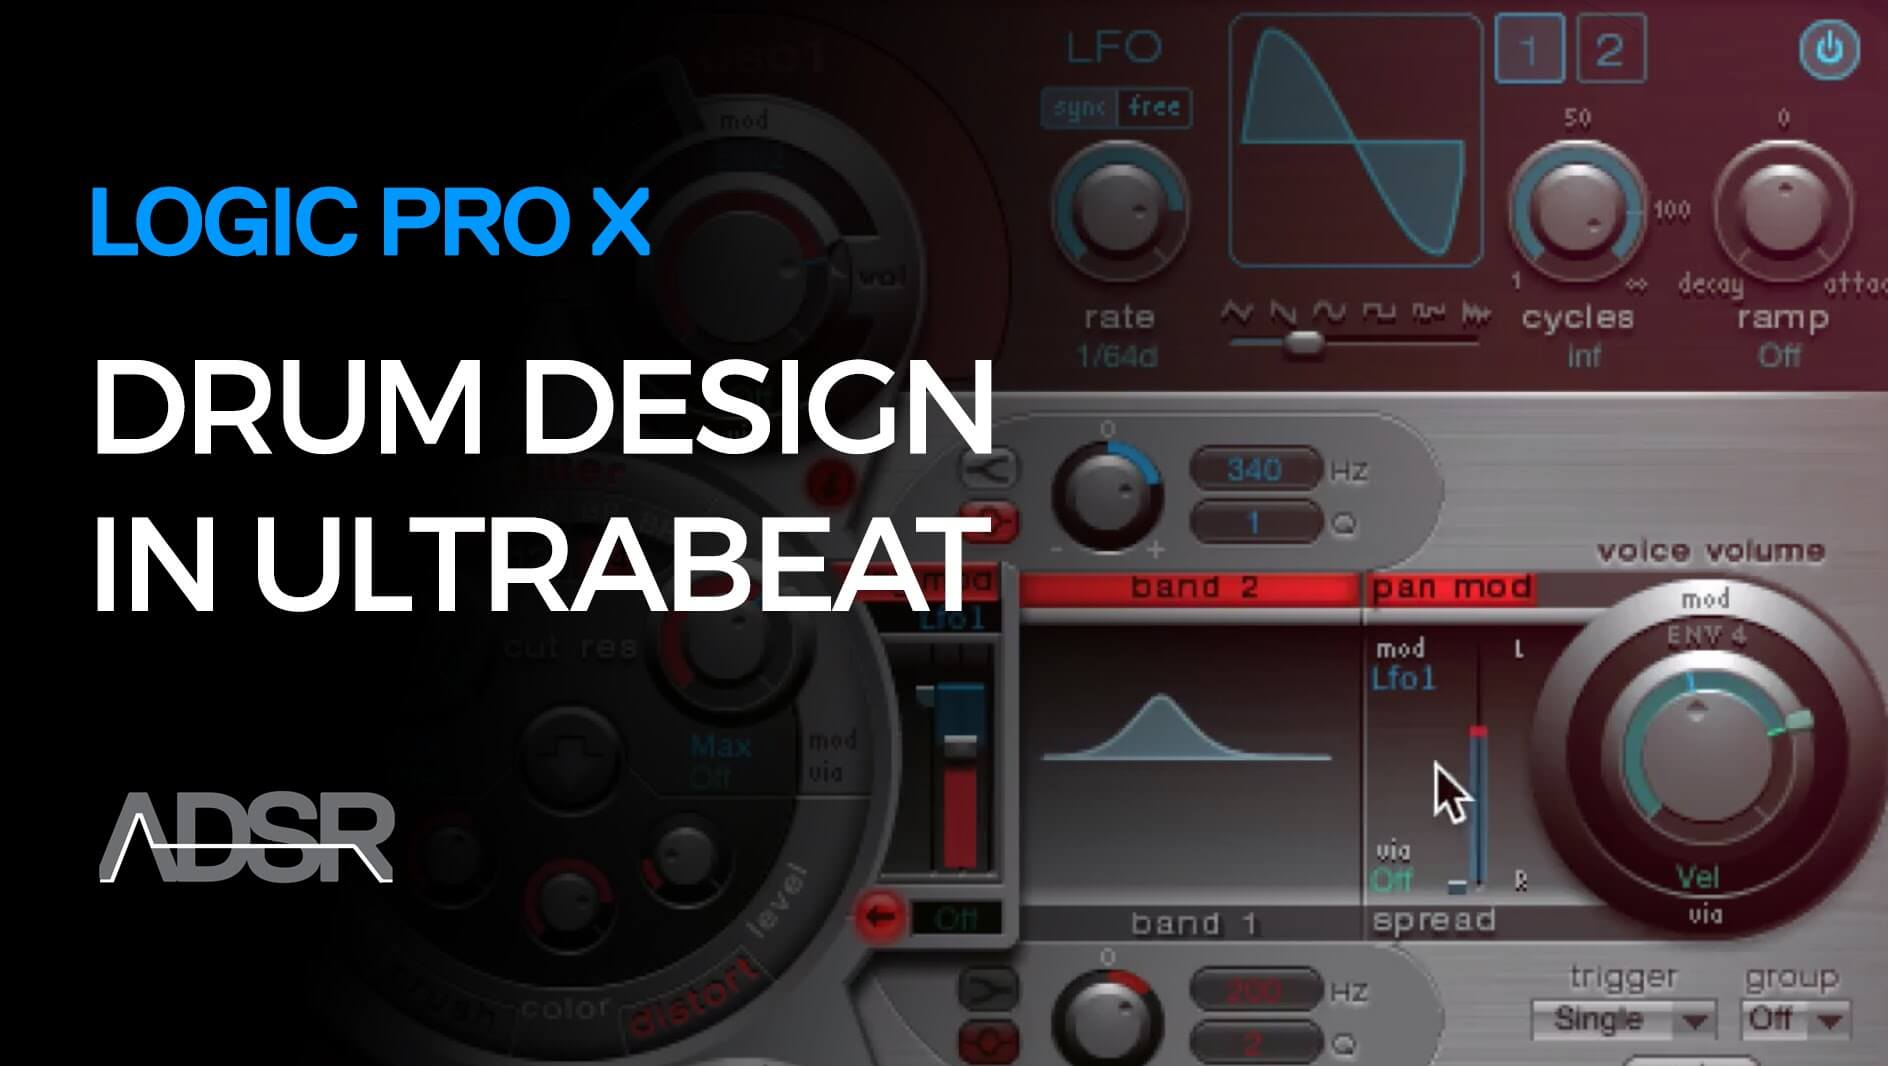 Drum Sound Design with Ultrabeat in Logic Pro X